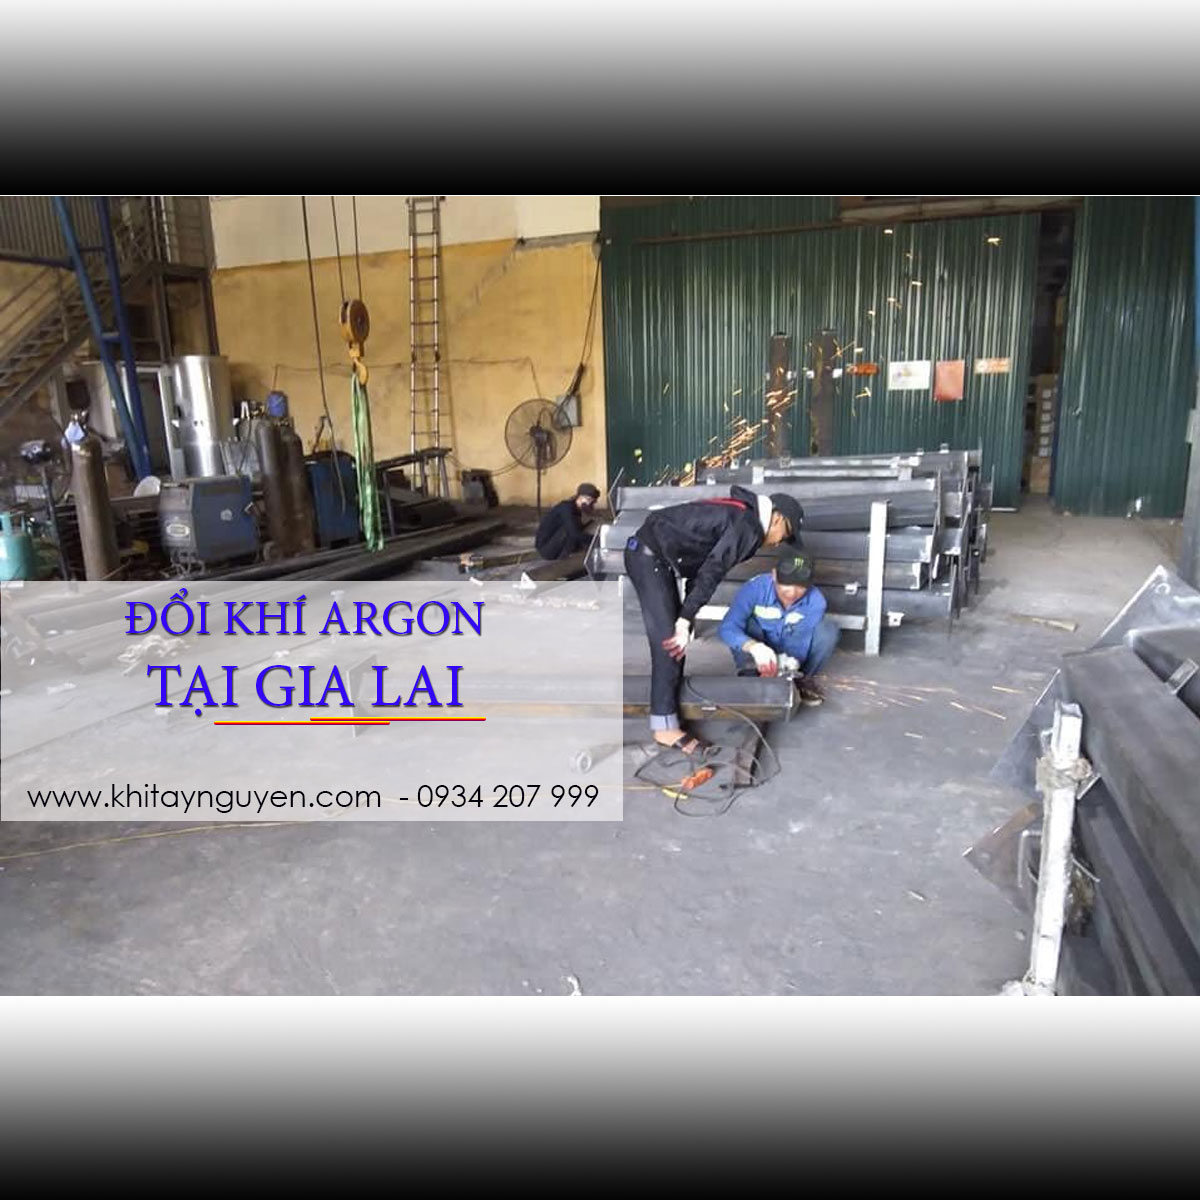 Đổi-khí-Argon-tại-Gia-Lai